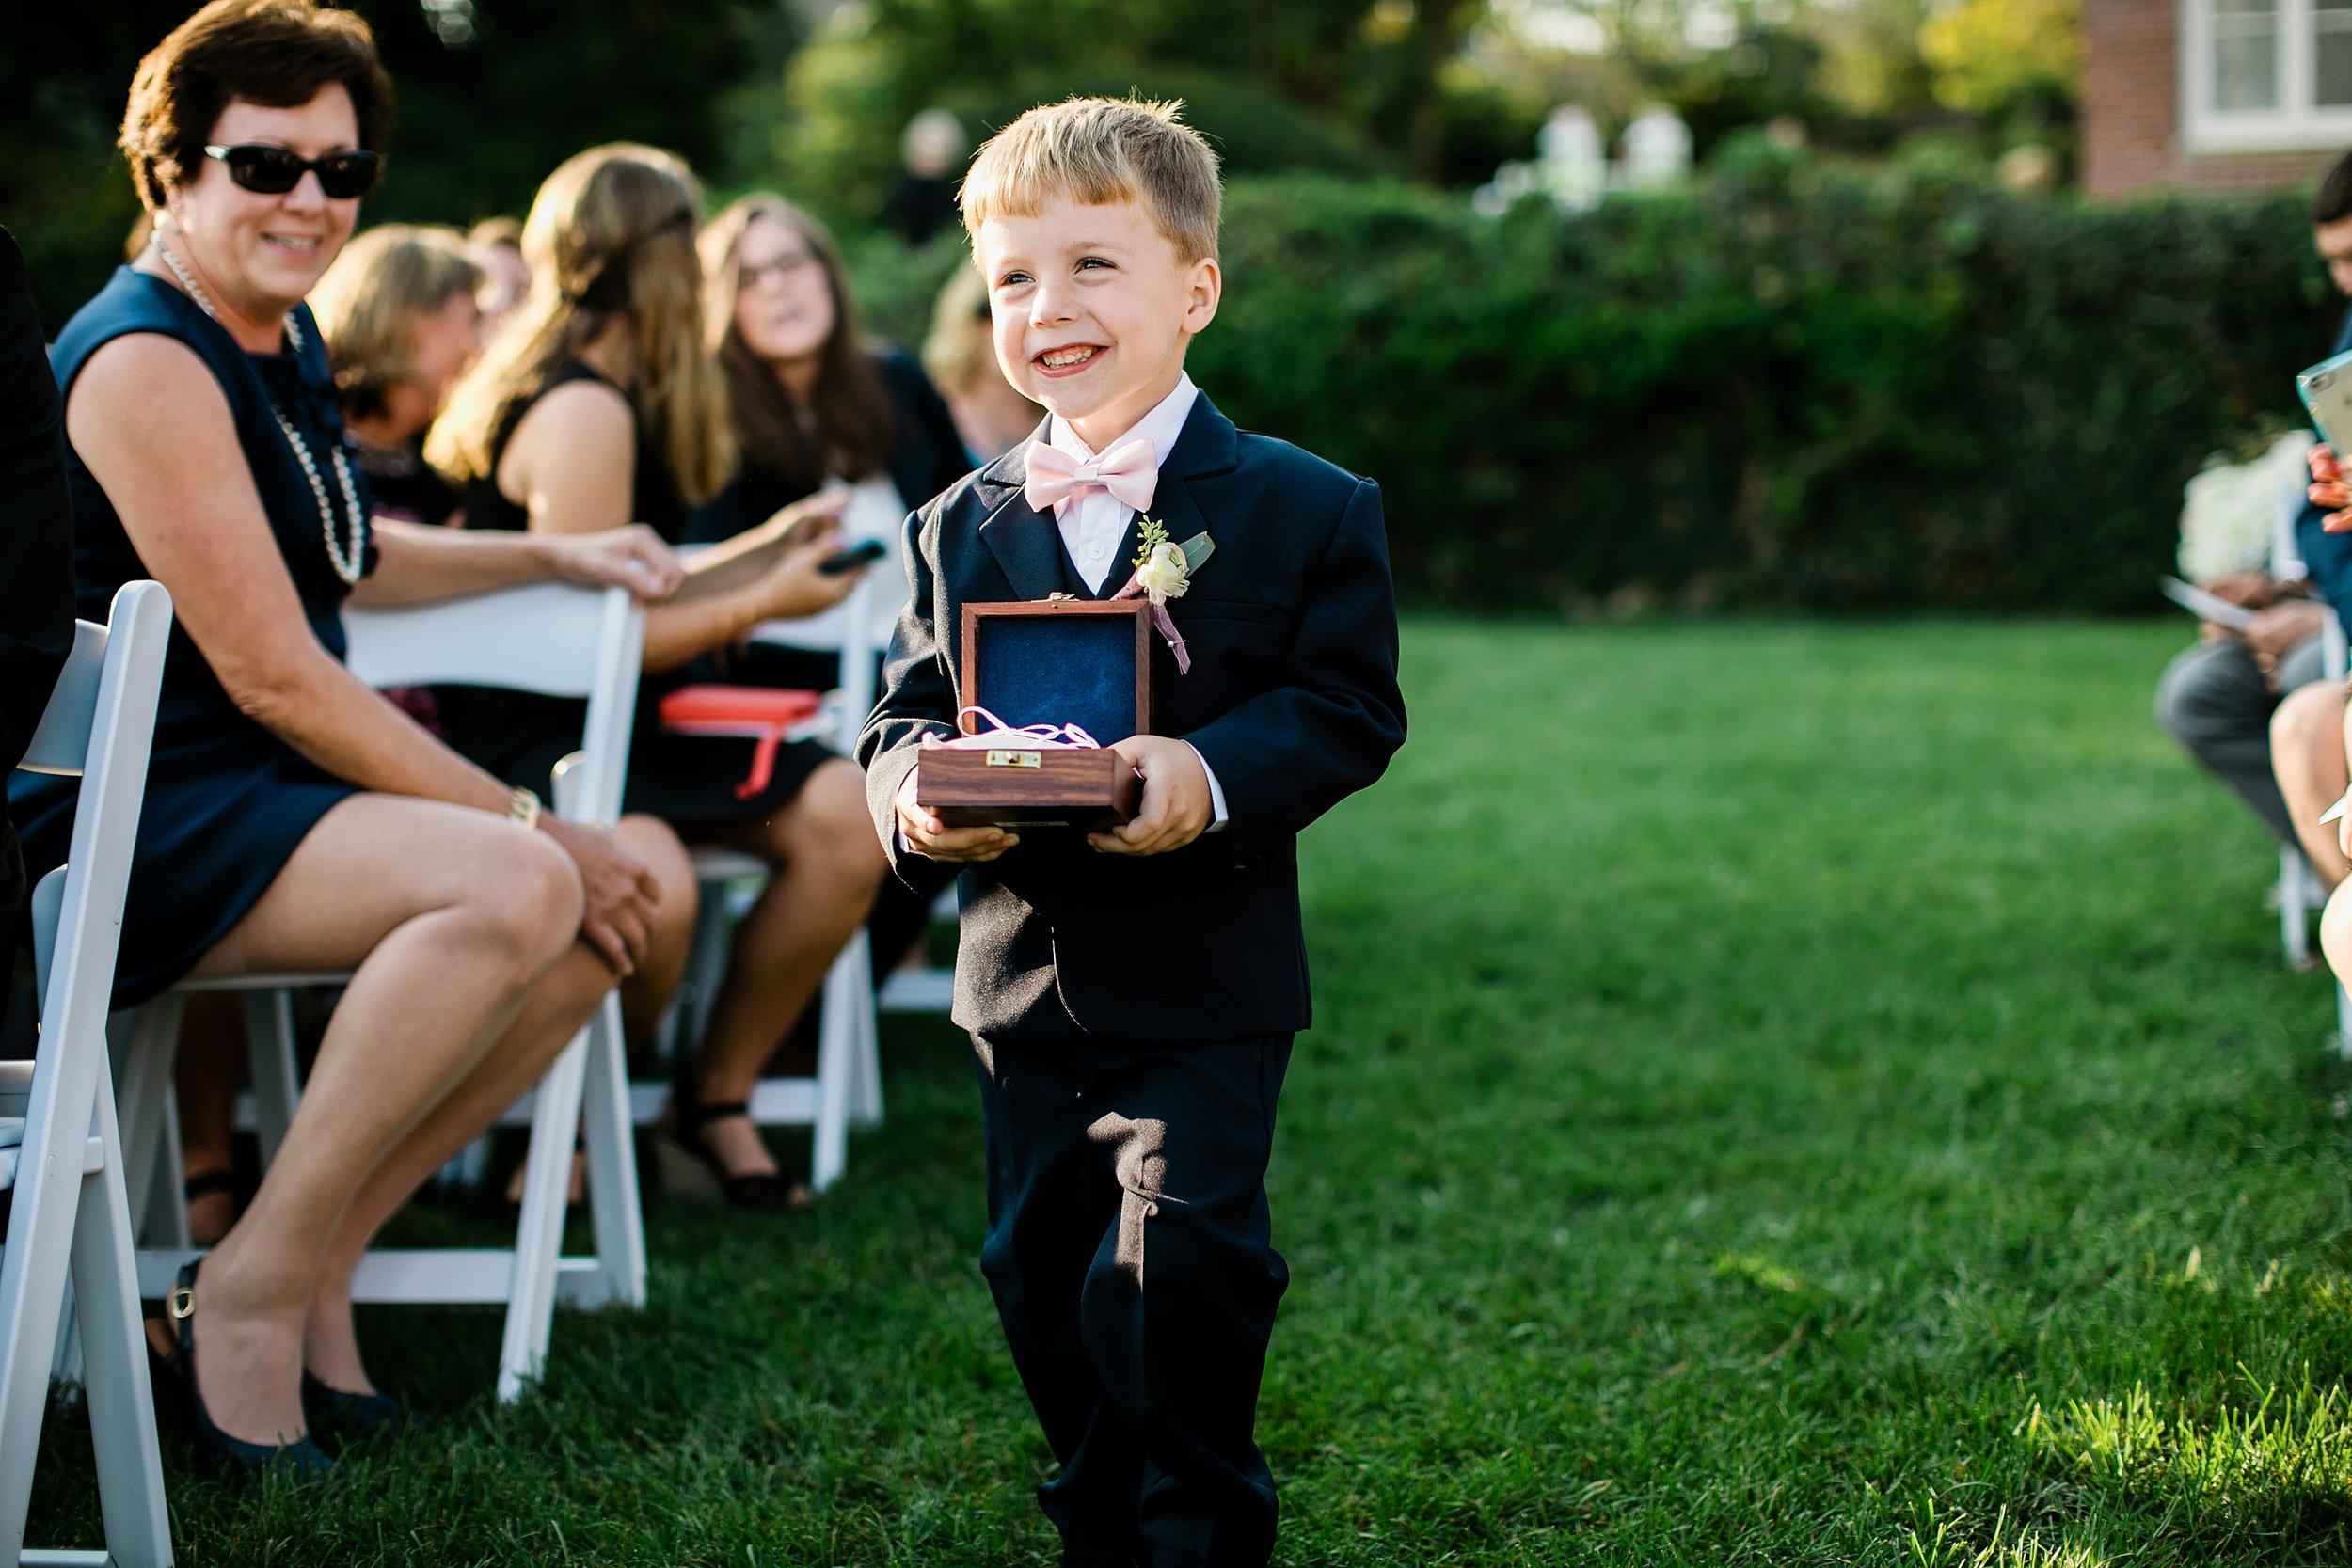 024 los angeles wedding photographer todd danforth photography boston.jpg